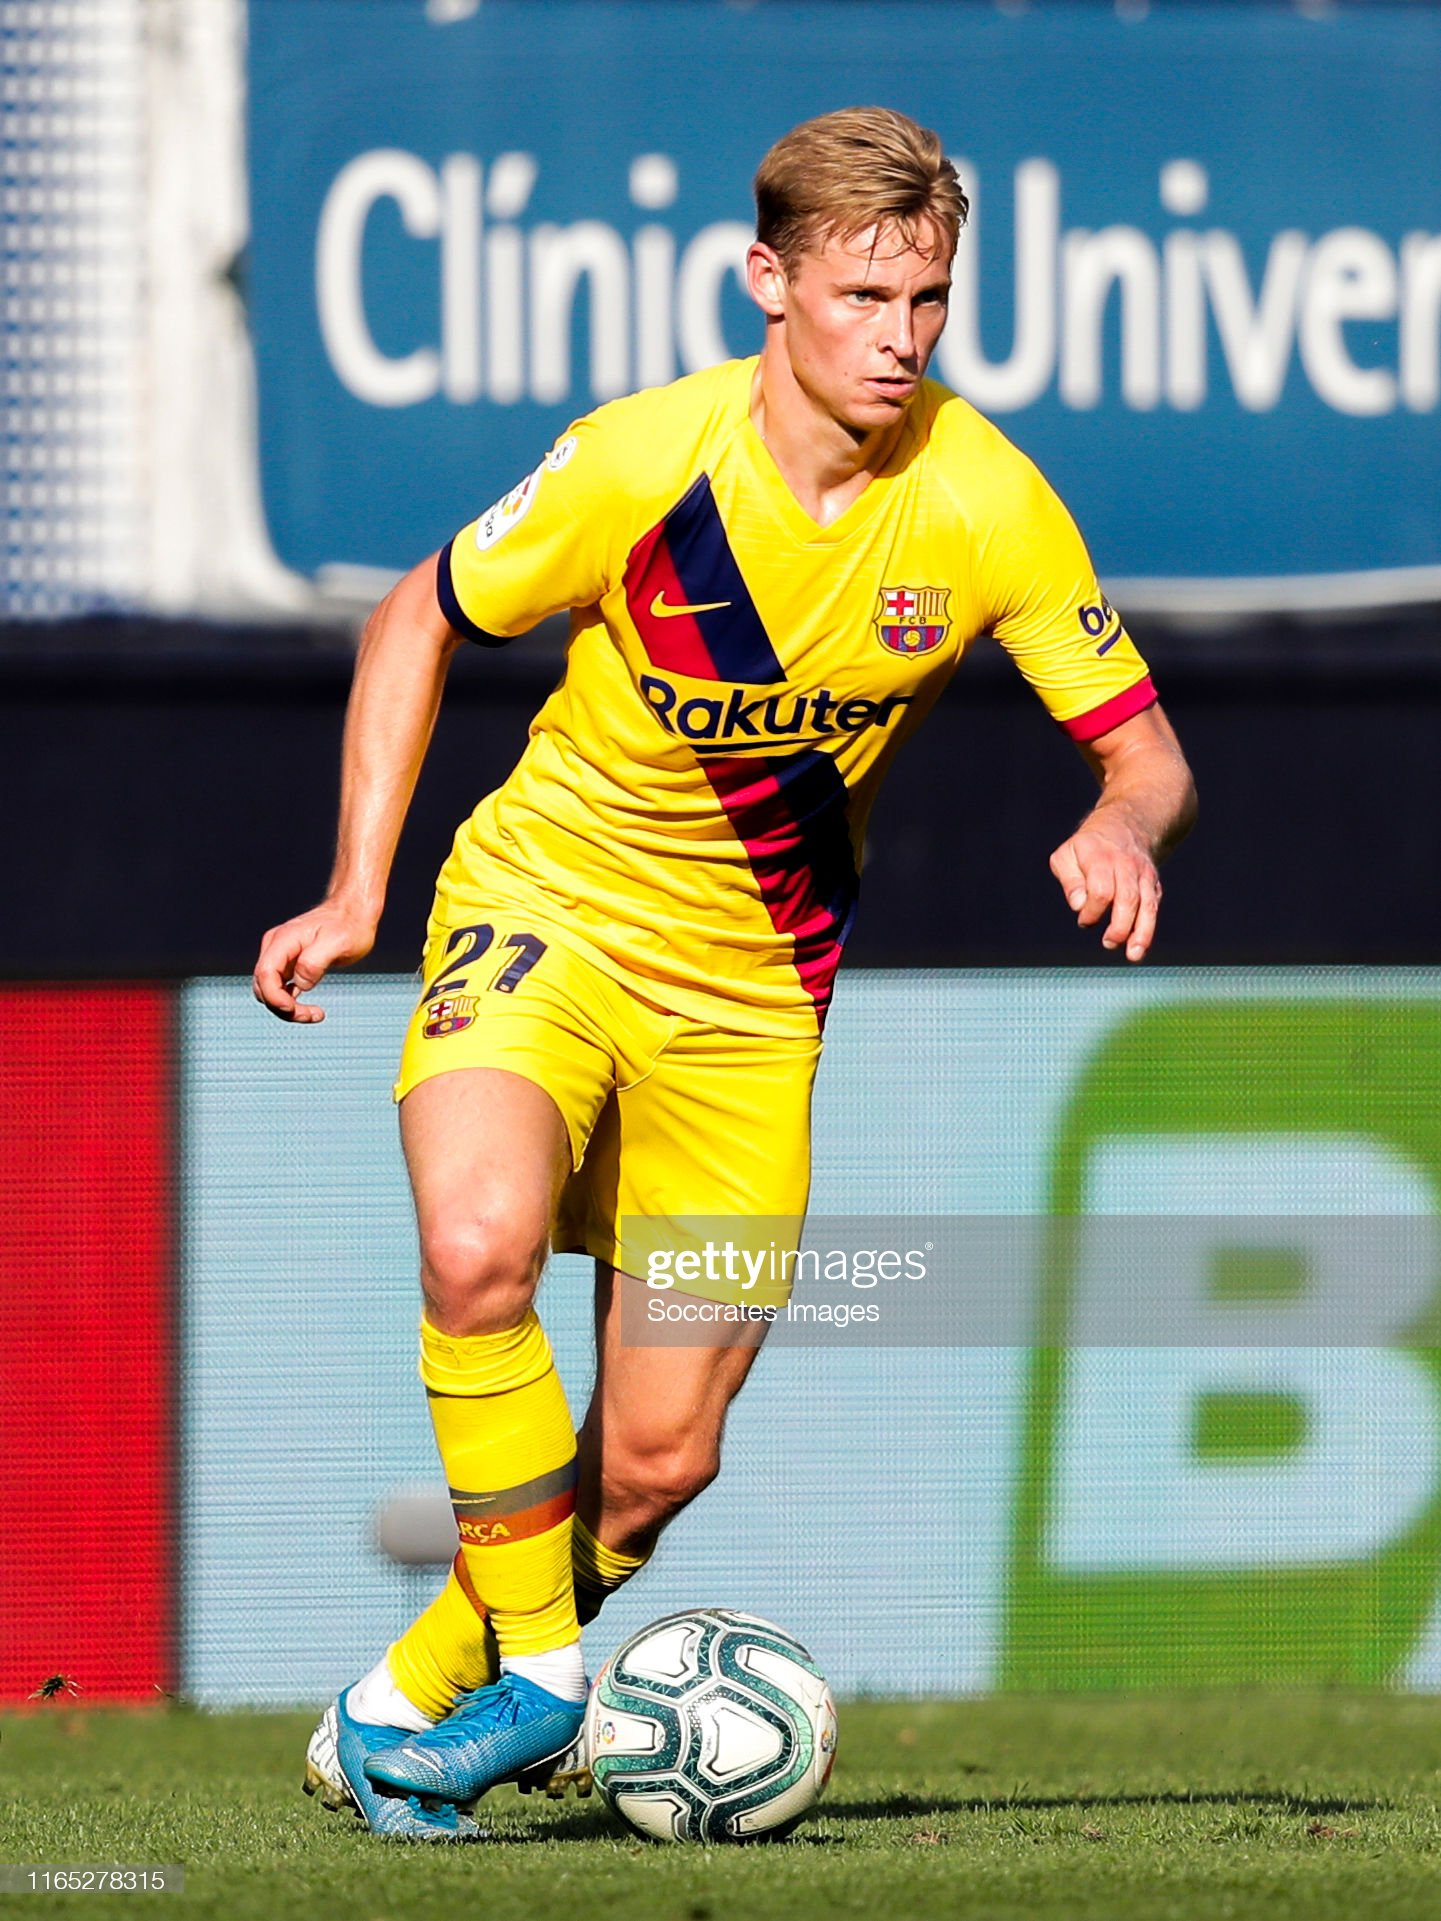 صور مباراة : أوساسونا - برشلونة 2-2 ( 31-08-2019 )  Frenkie-de-jong-of-fc-barcelona-during-the-la-liga-santander-match-picture-id1165278315?s=2048x2048